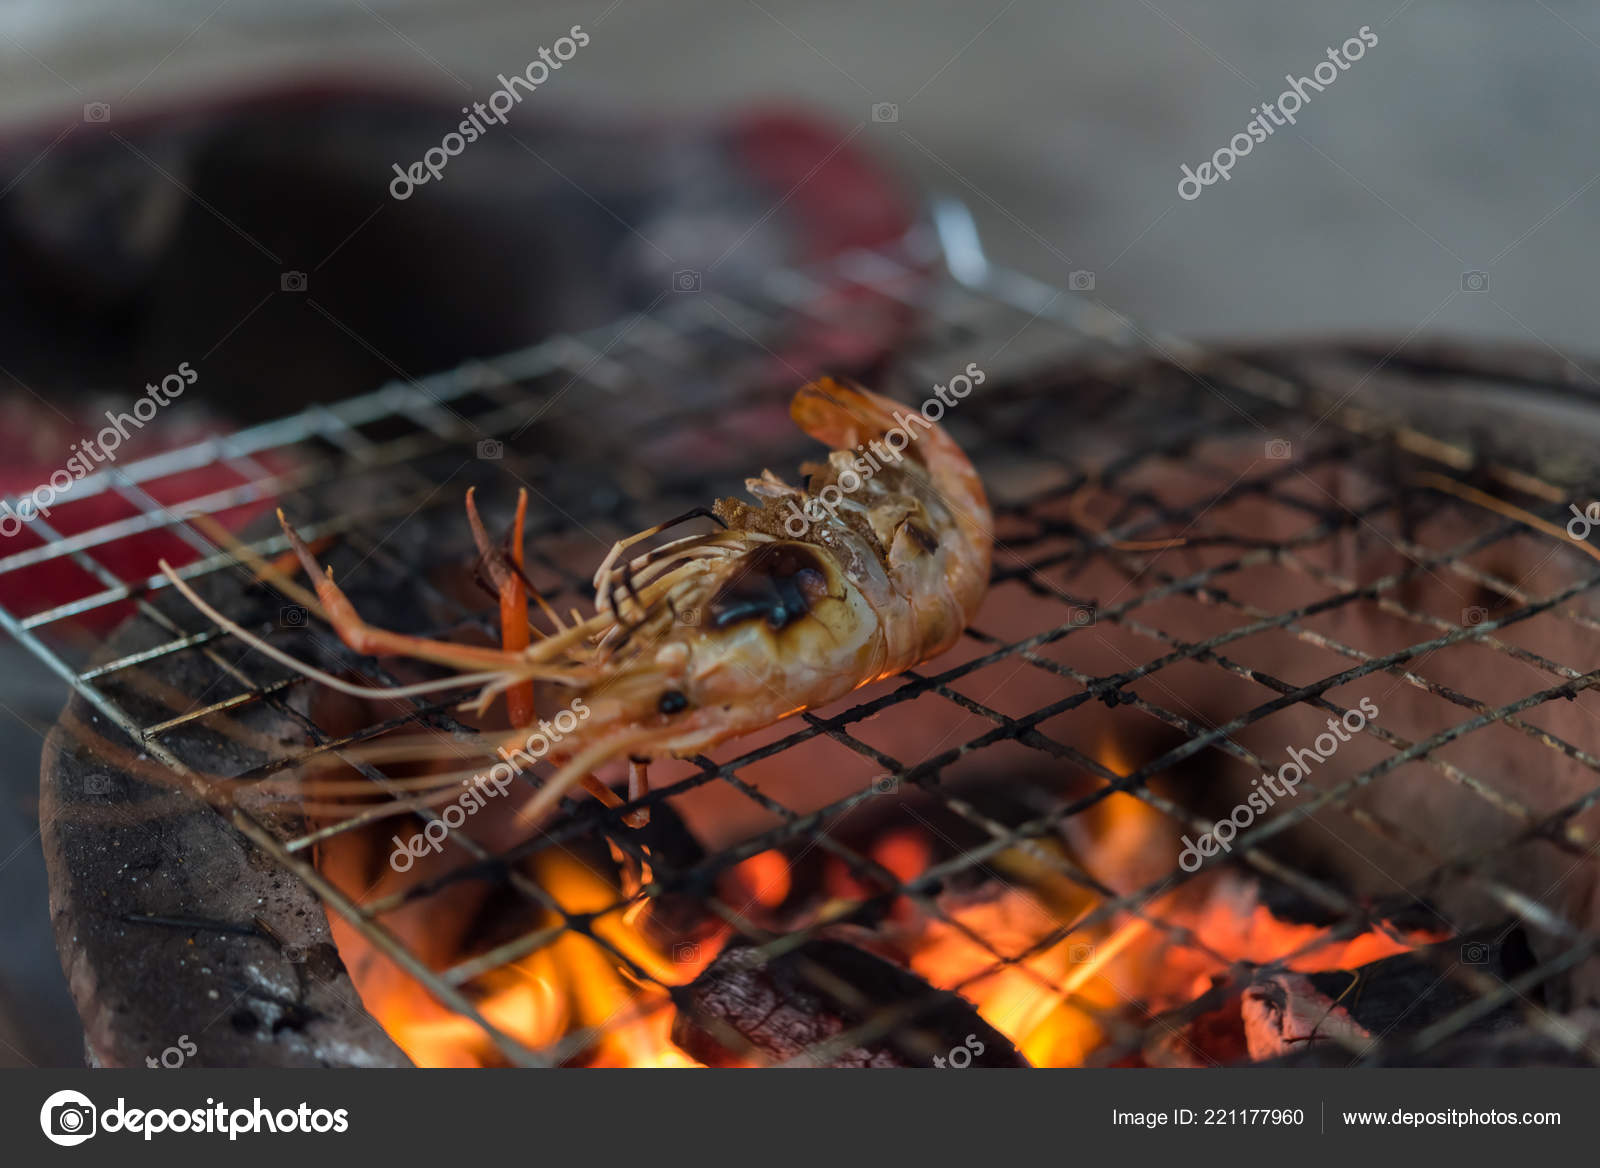 Grilled Shrimp Giant Freshwater Prawn Grilling Charcoal Sale Thai